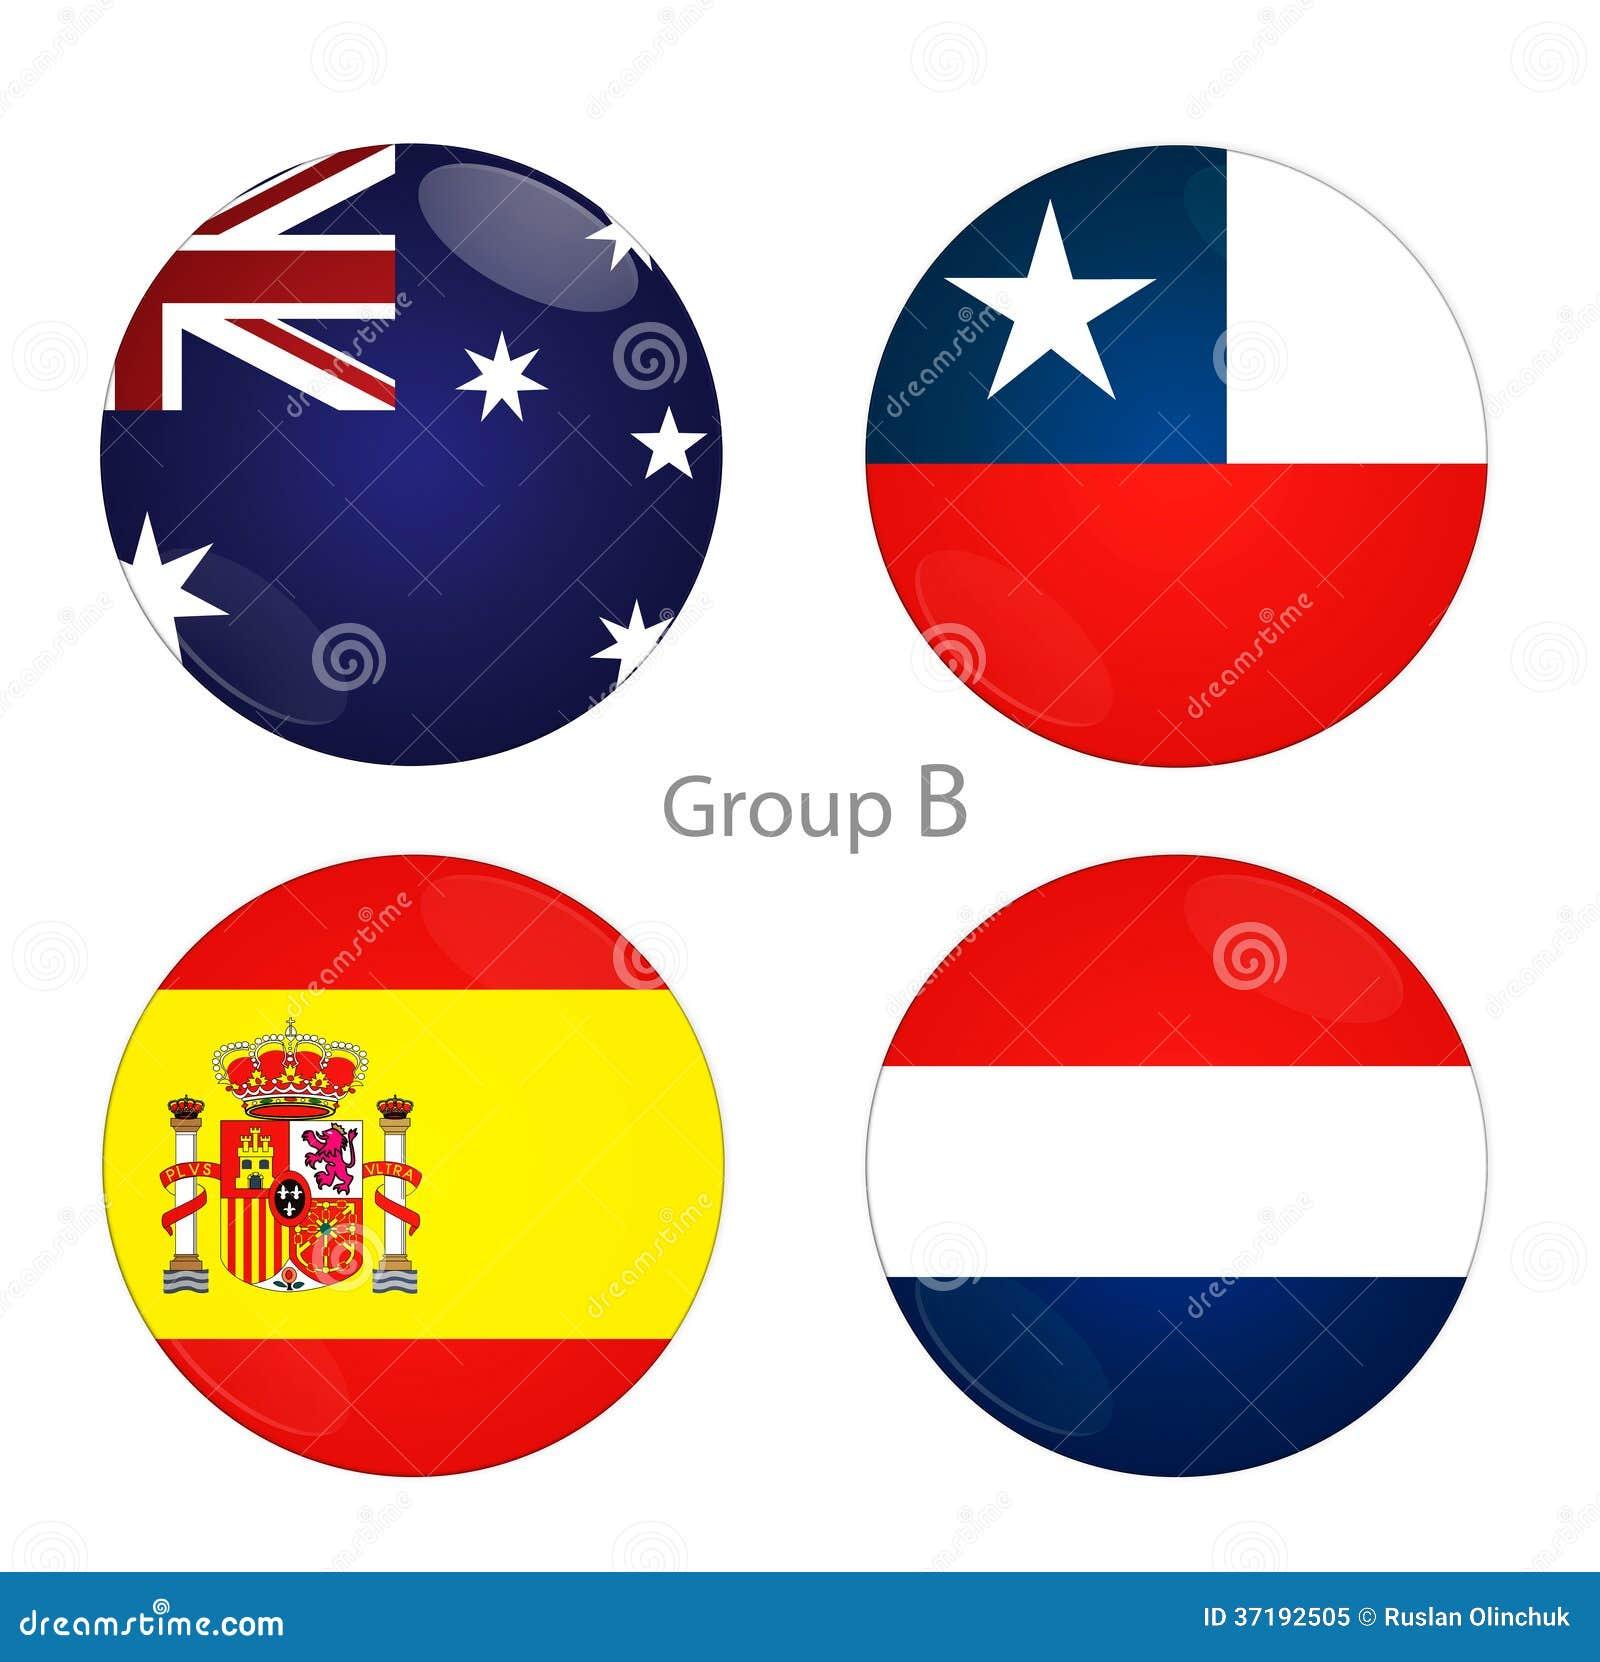 Group sex online in Australia